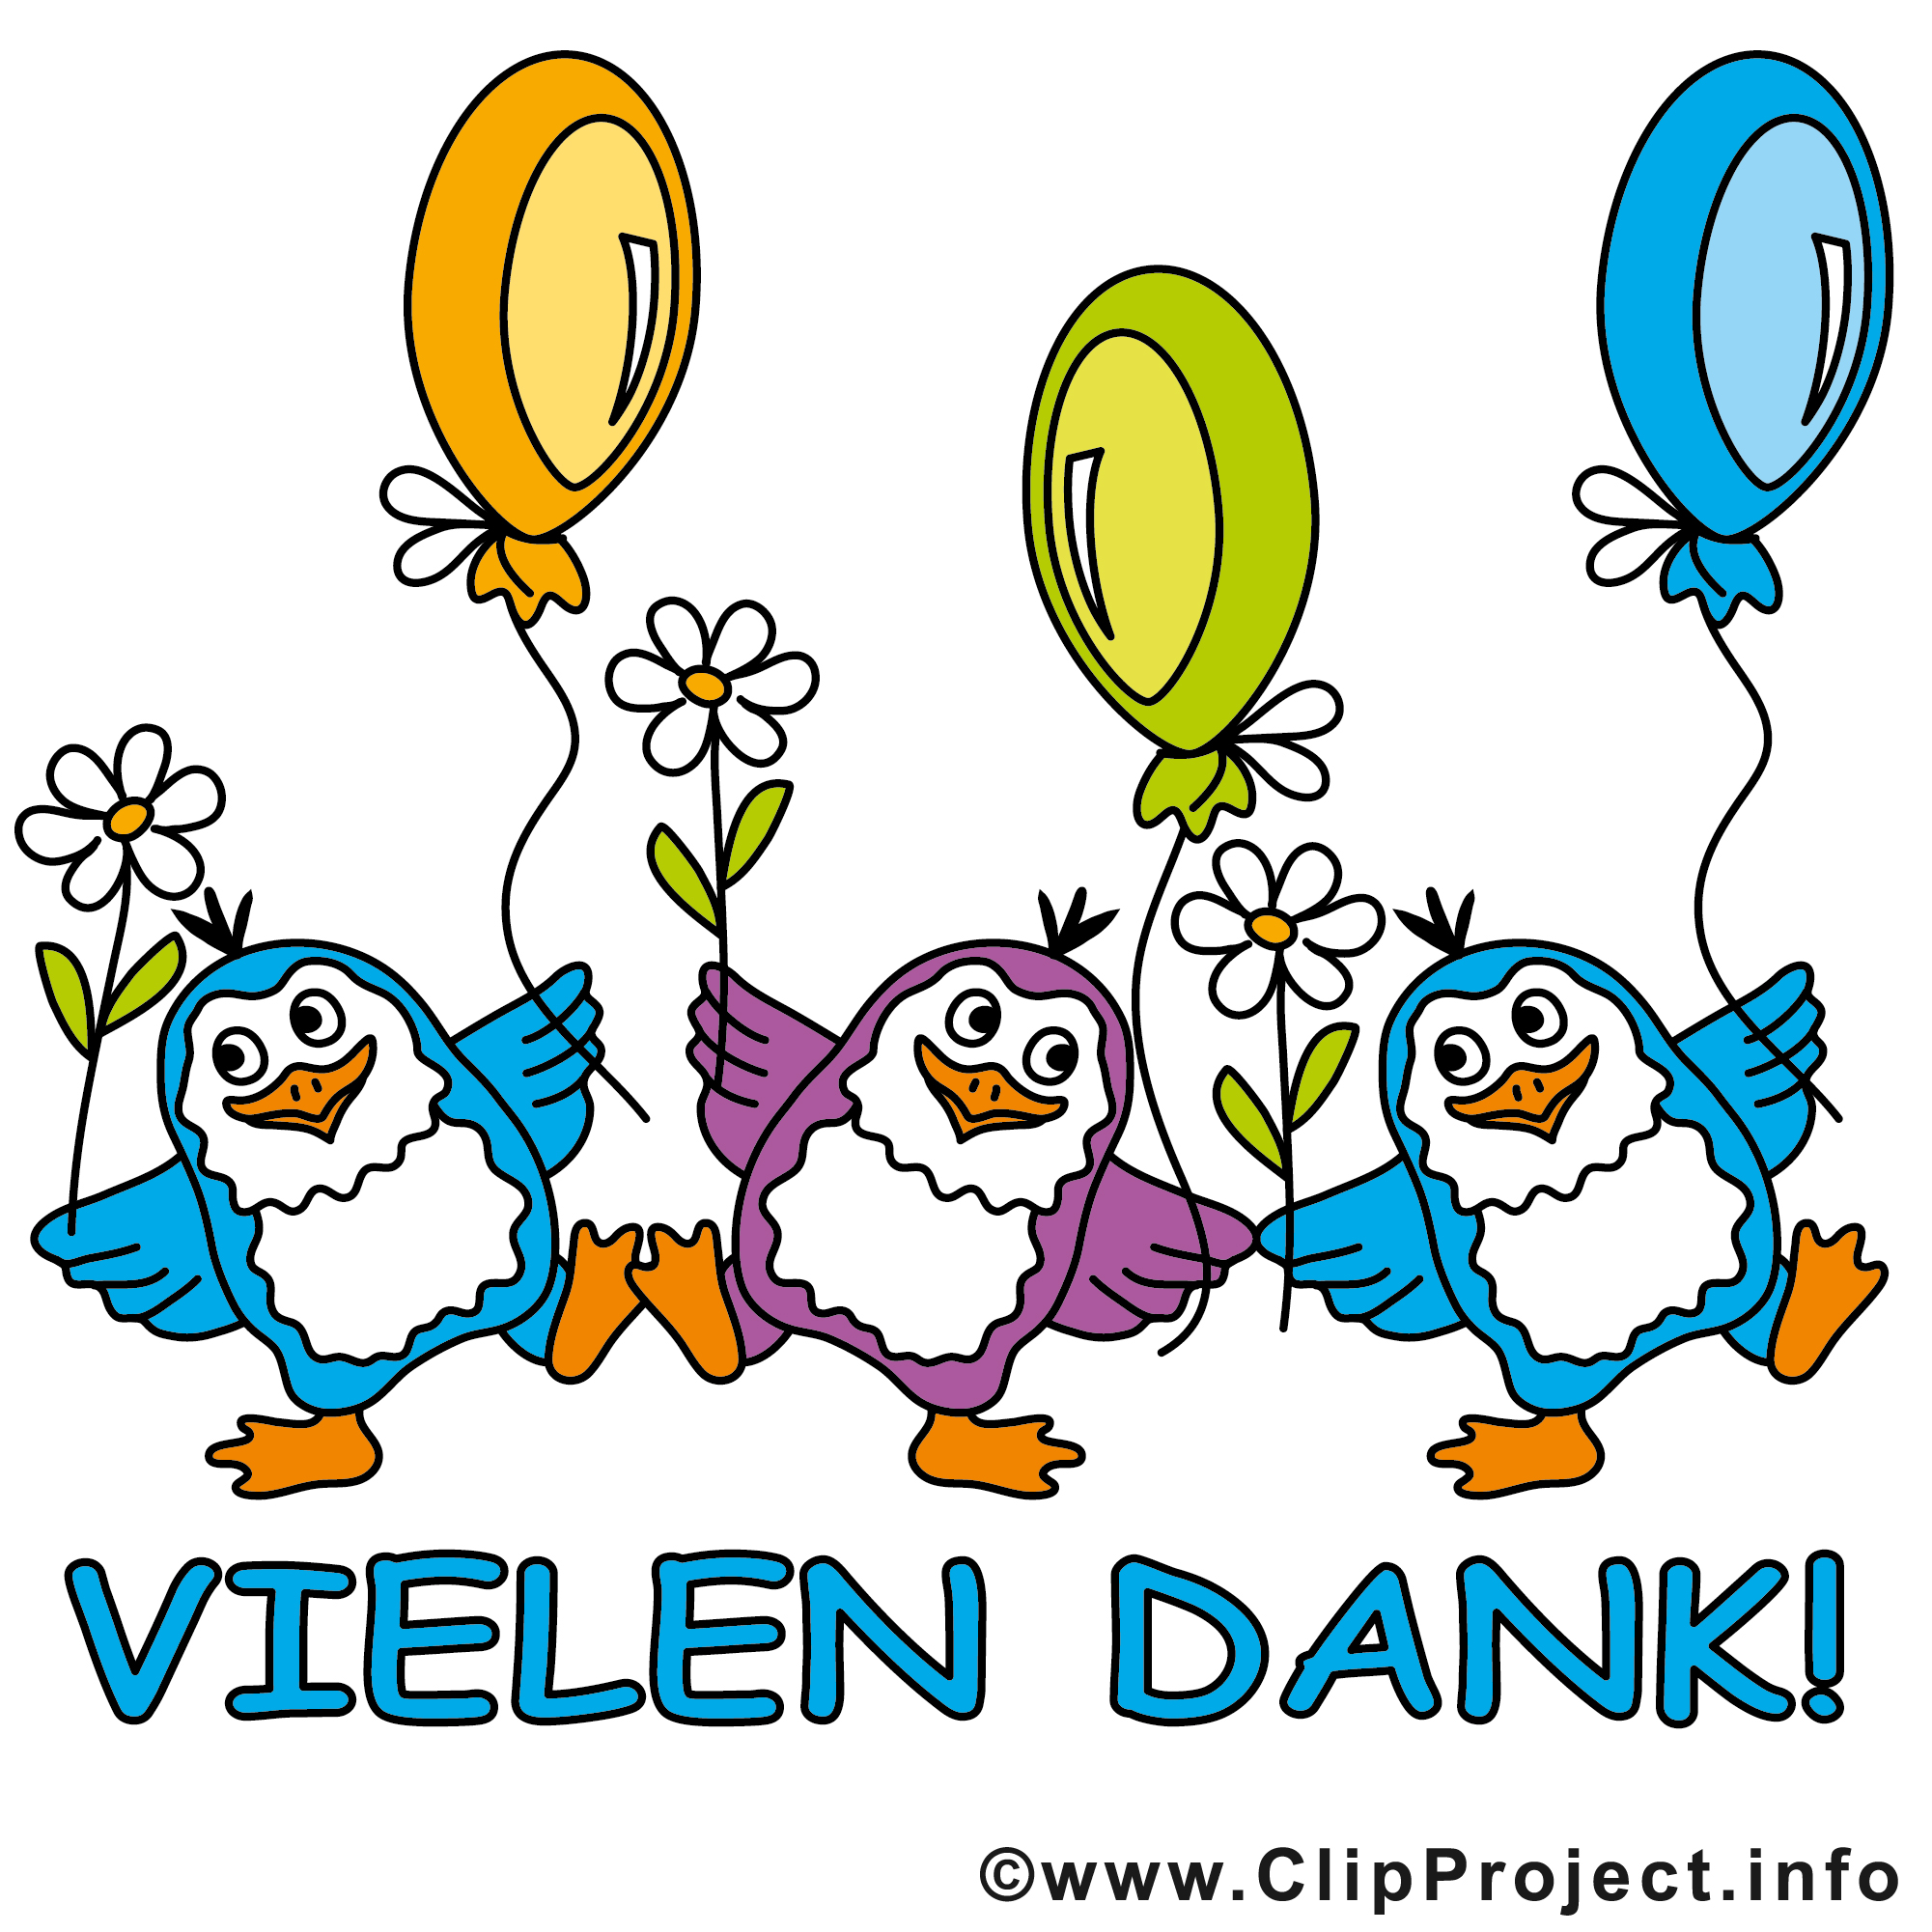 Herzlichen dank clipart picture royalty free download Danke Bilder, Cliparts, Cartoons, Grafiken, Illustrationen, Gifs ... picture royalty free download